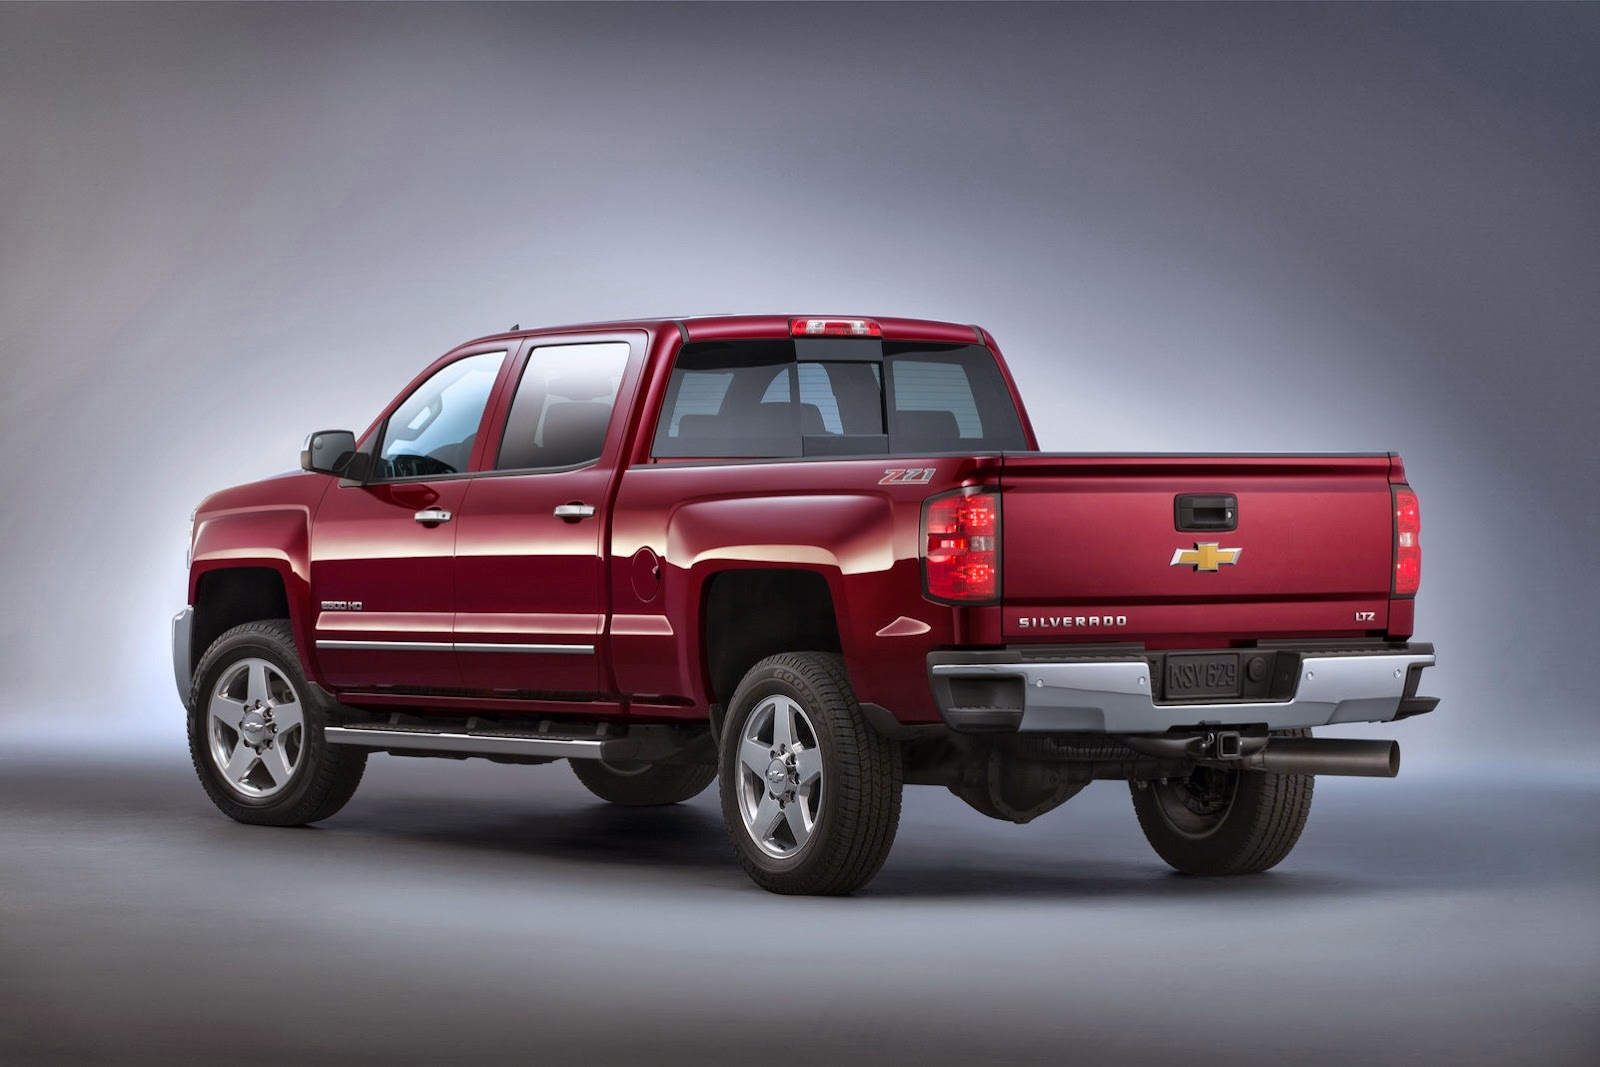 2015-Chevrolet-Silverado-3500-HD-17%25255B2%25255D.jpg